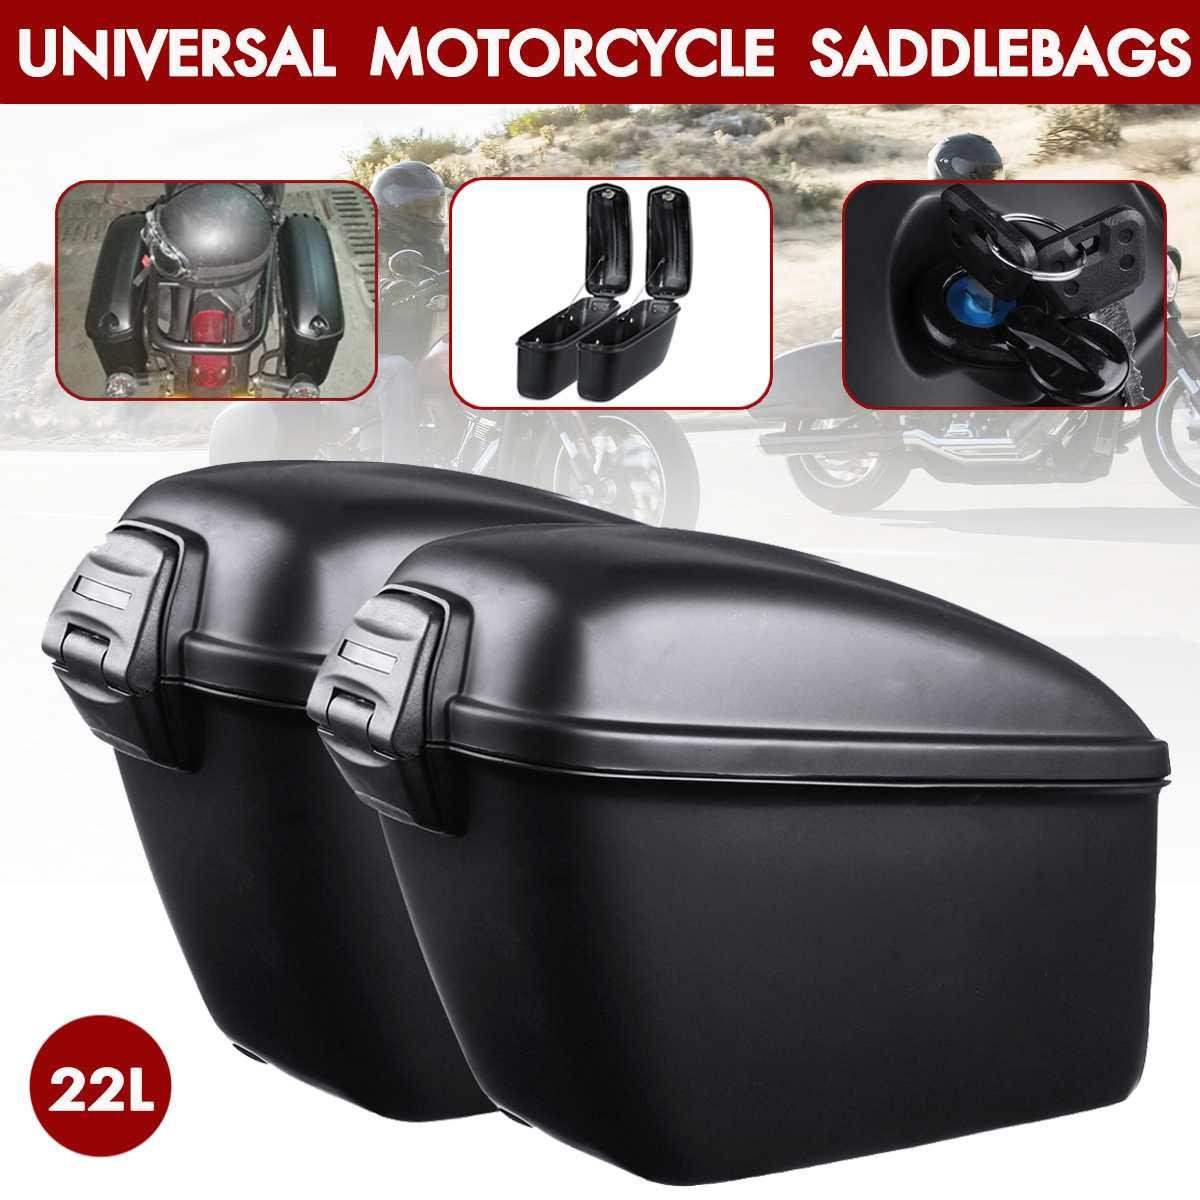 Par Universal 22L motocicleta parte trasera caja de sillín bolsa de equipaje lateral bolsas de sillín para Harley/Suzuki/Yamaha/ honda